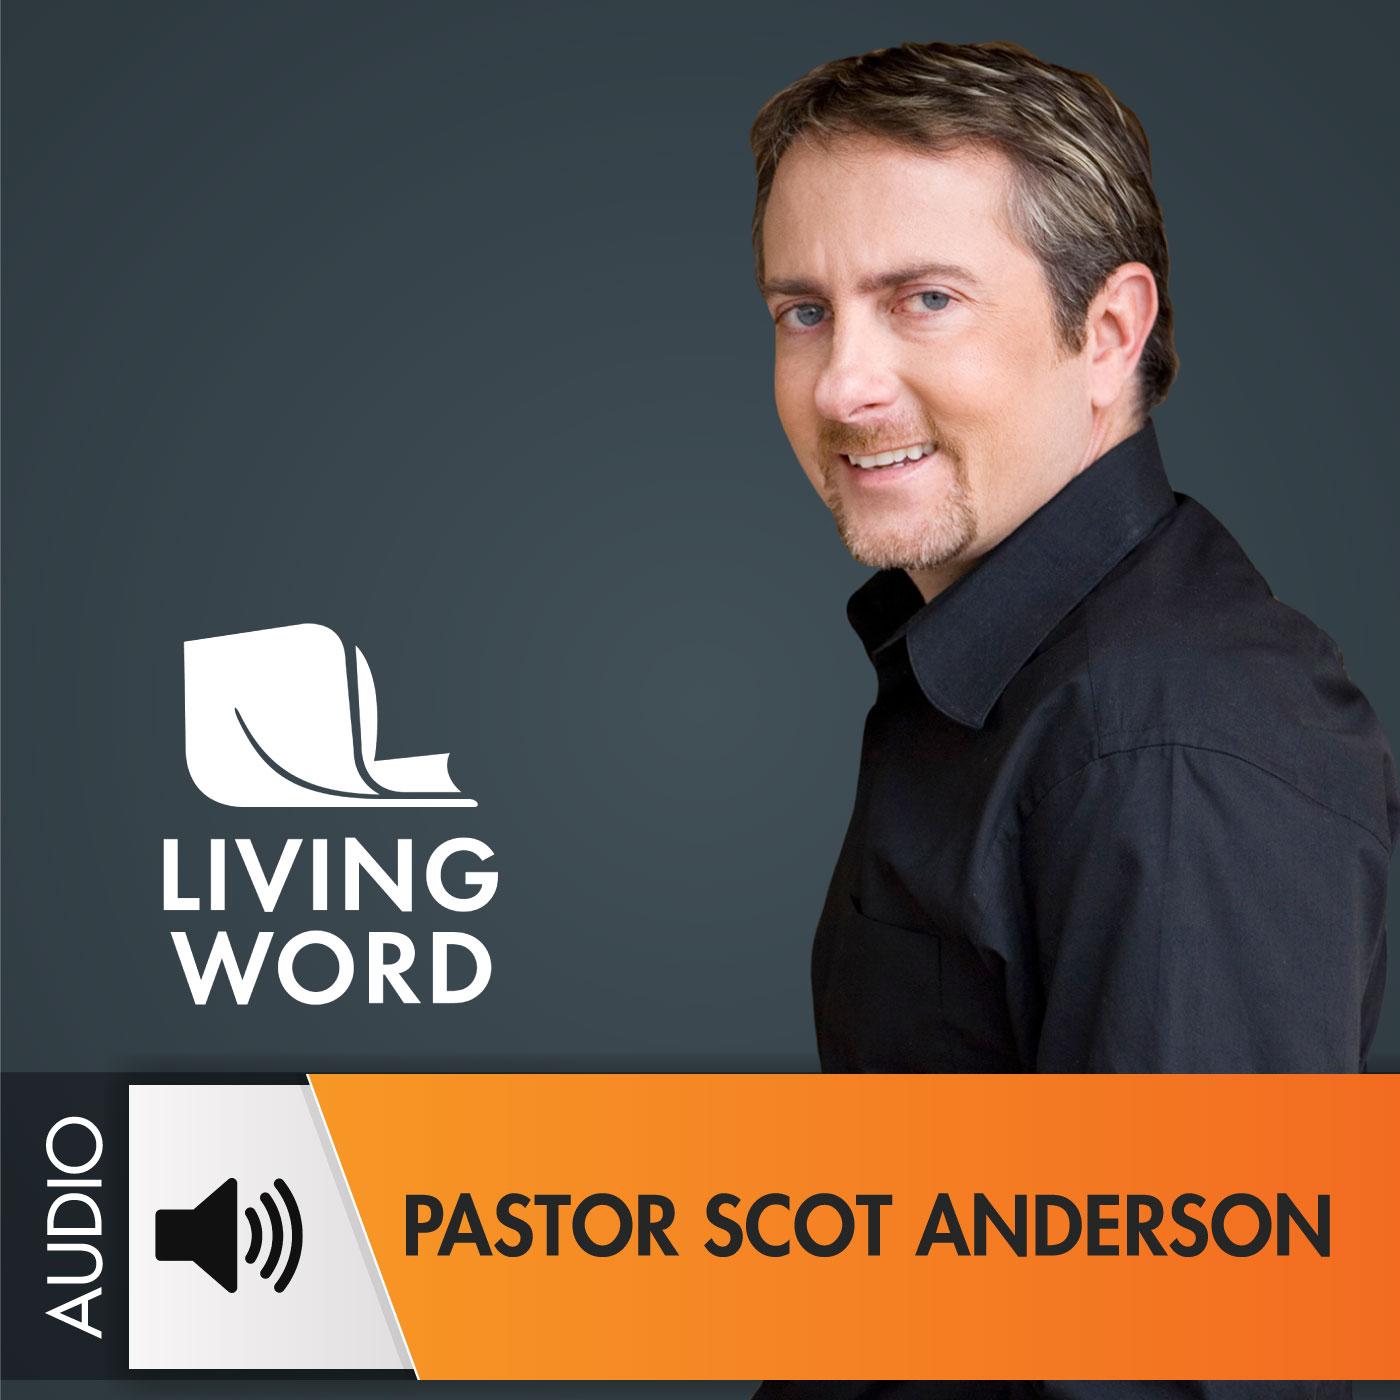 Pastor Scot Anderson - Audio